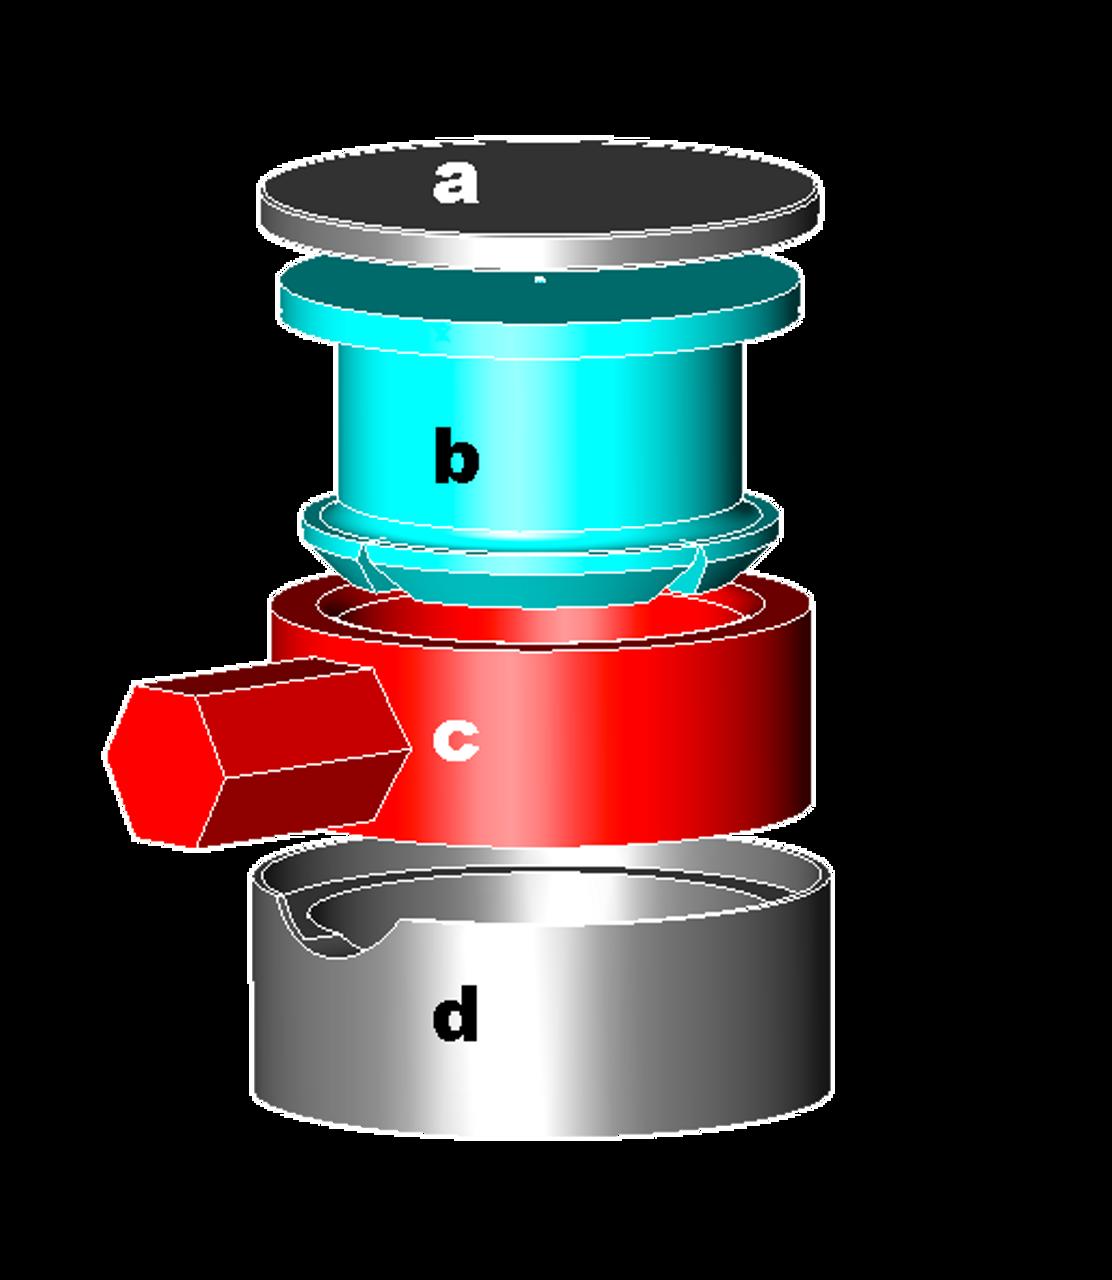 DA1Kit Installation Instruction Diagram